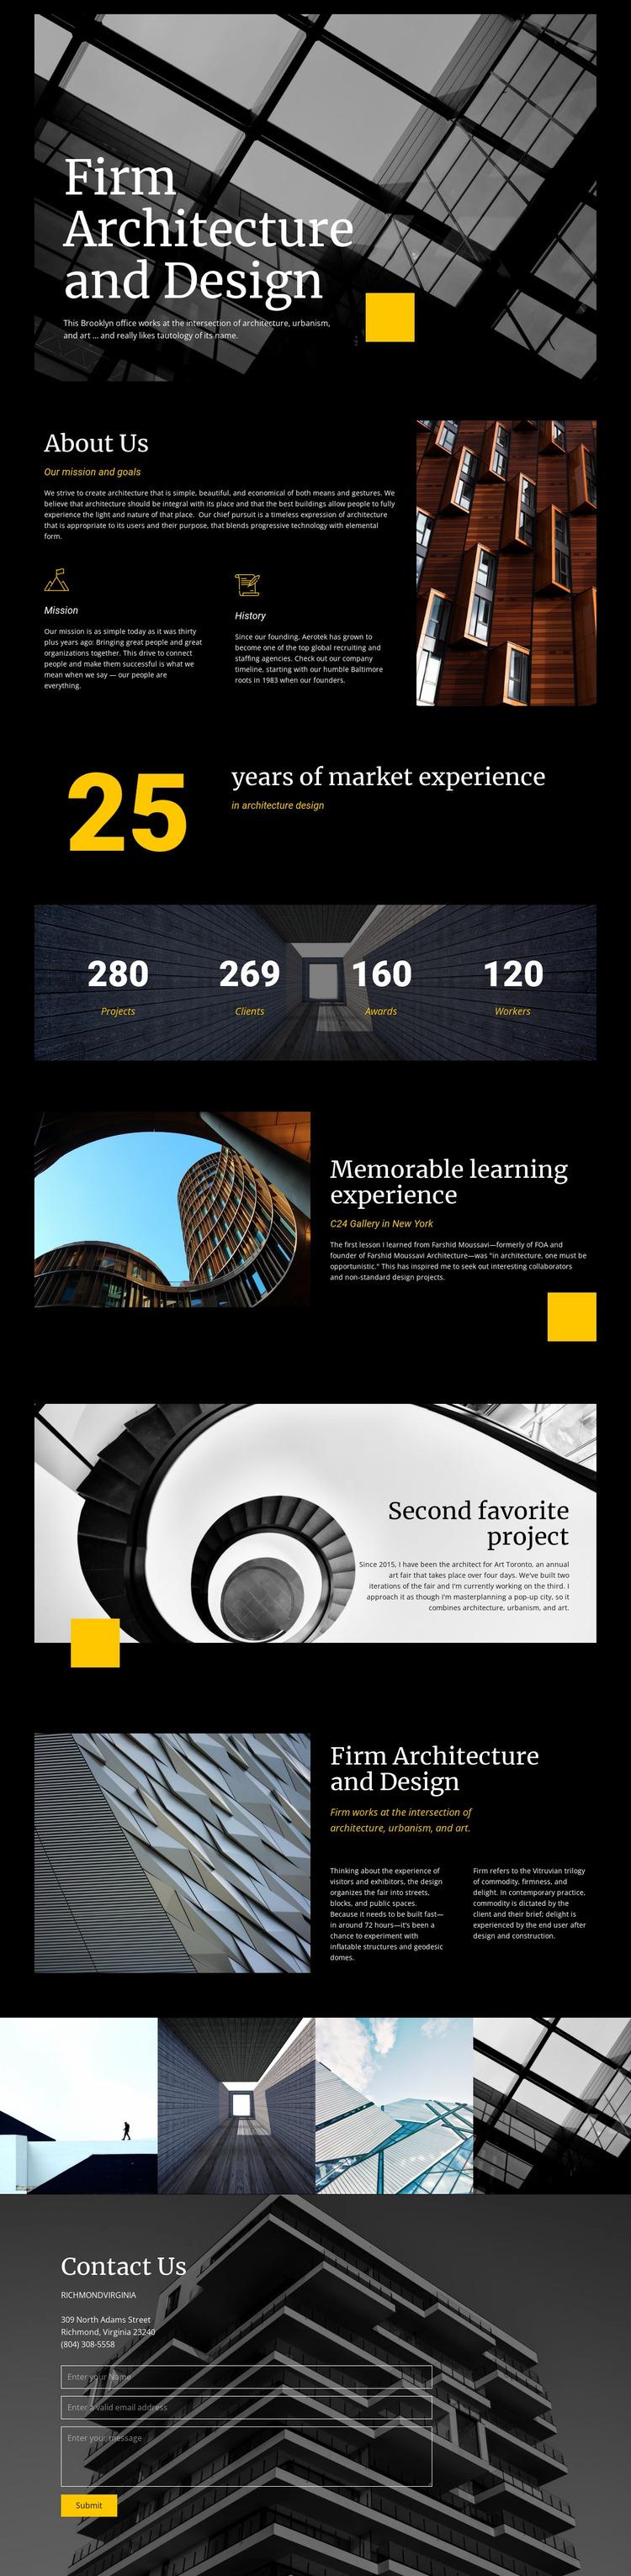 Firm architecture and Design WordPress Website Builder